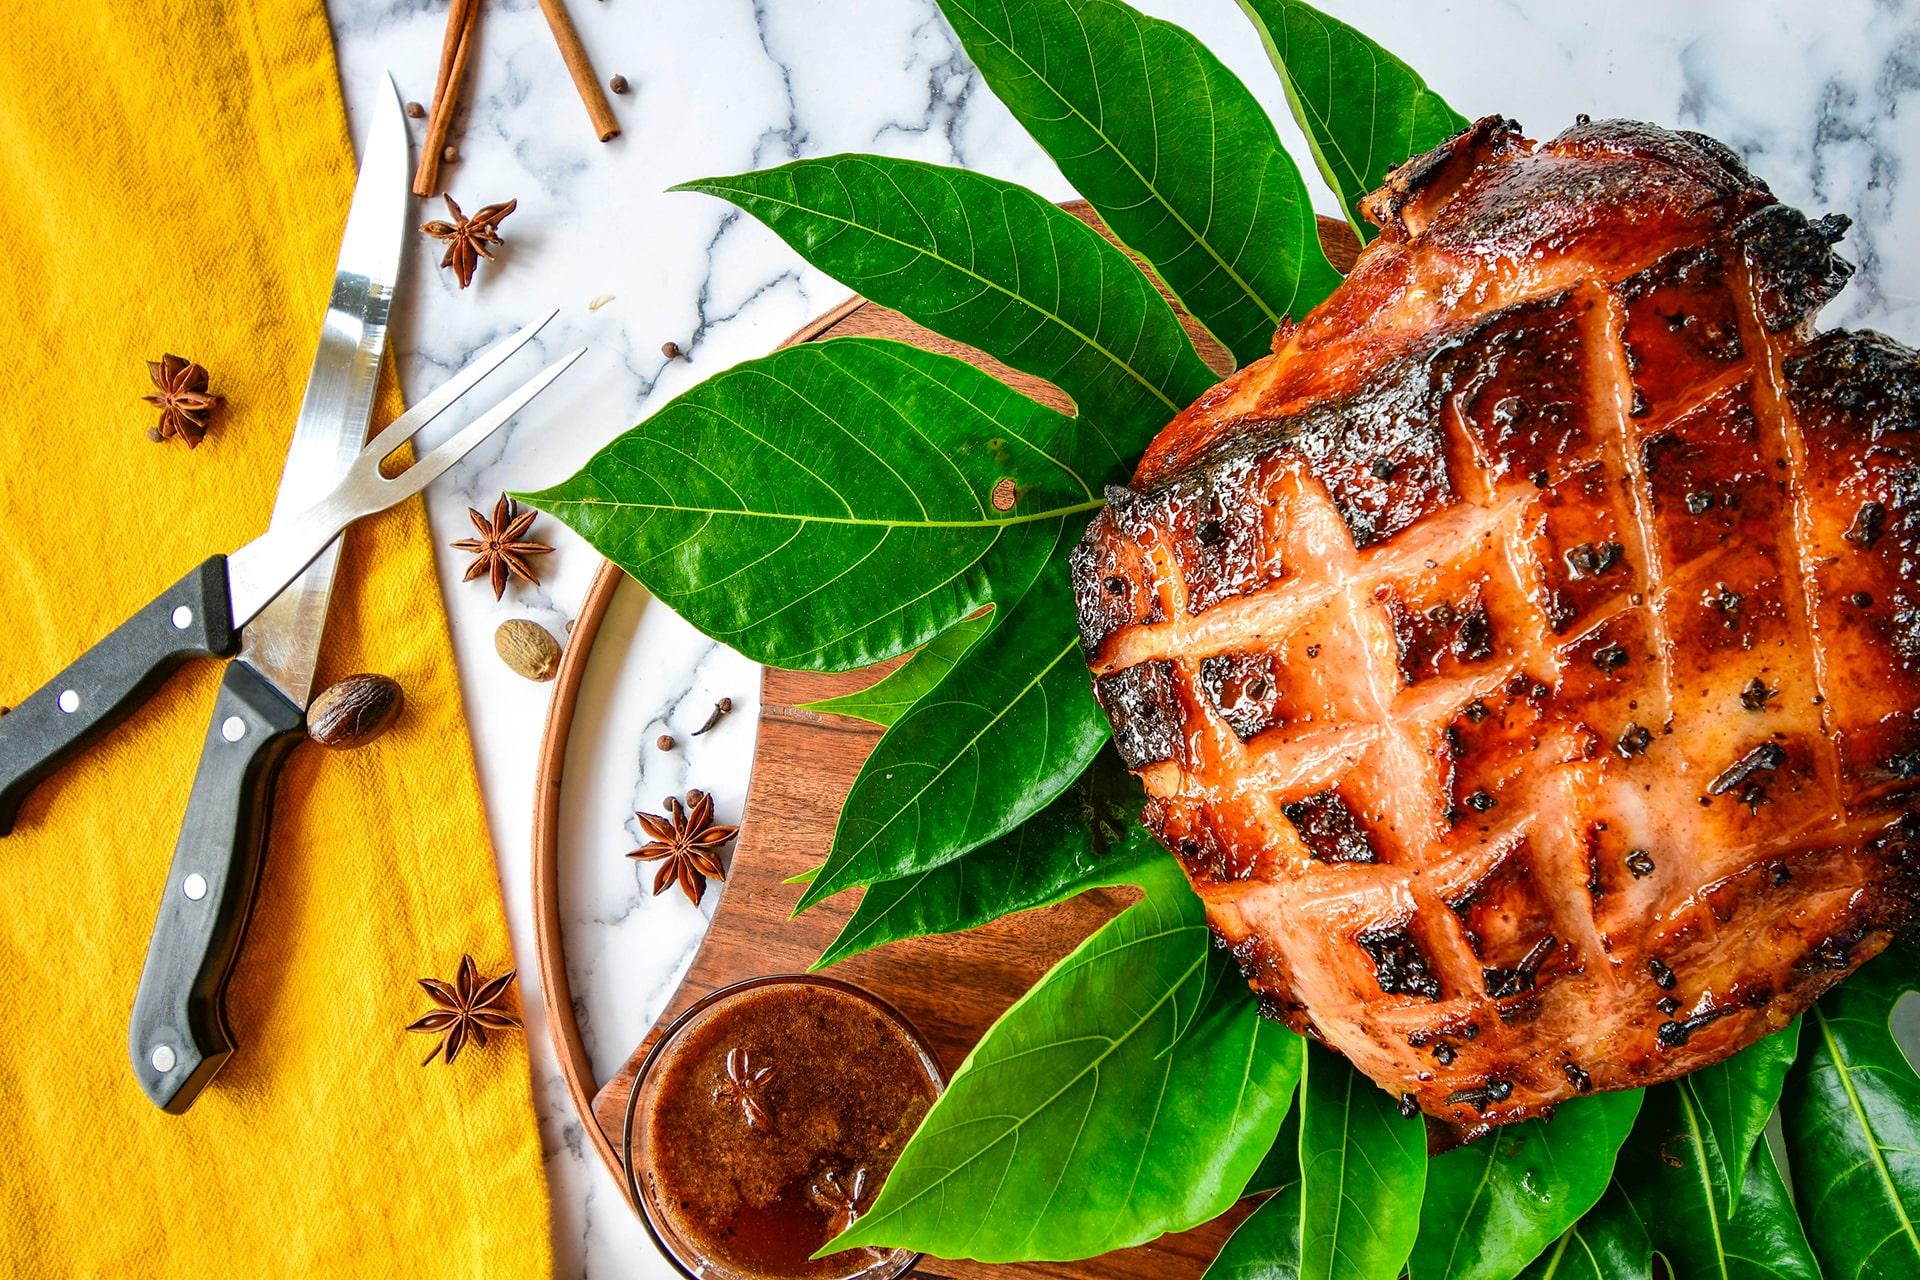 Spiced Maple Picnic Ham